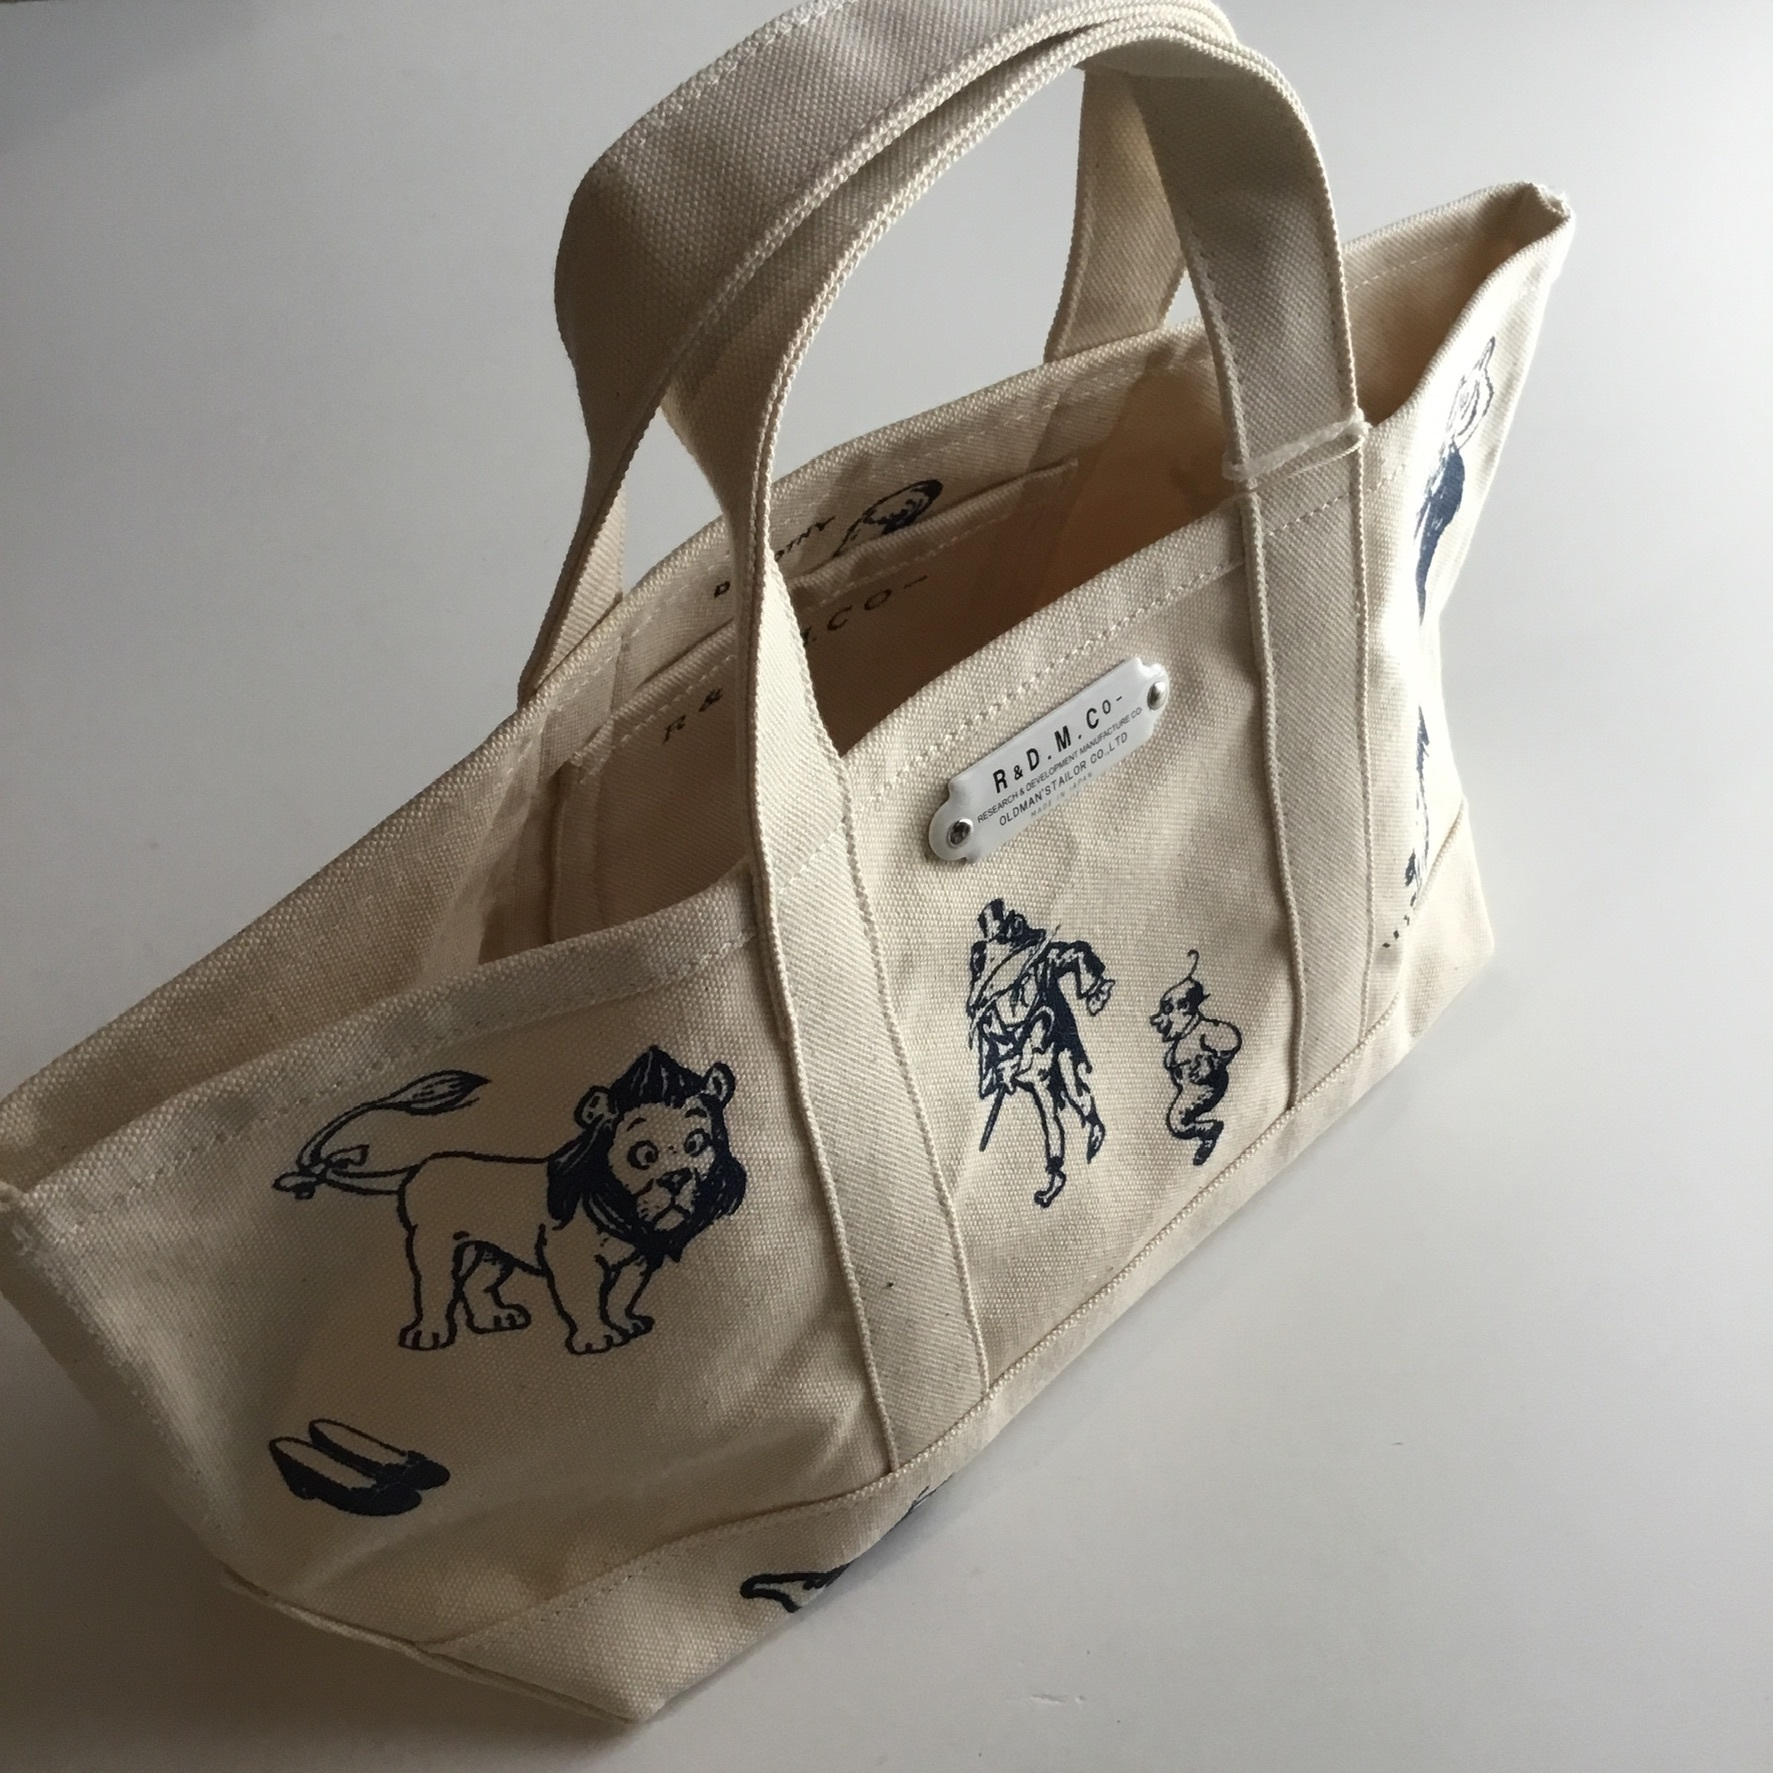 R&D.M.Co-/OLDMAN'S TAILOR OZ suprise tote bag size S natural